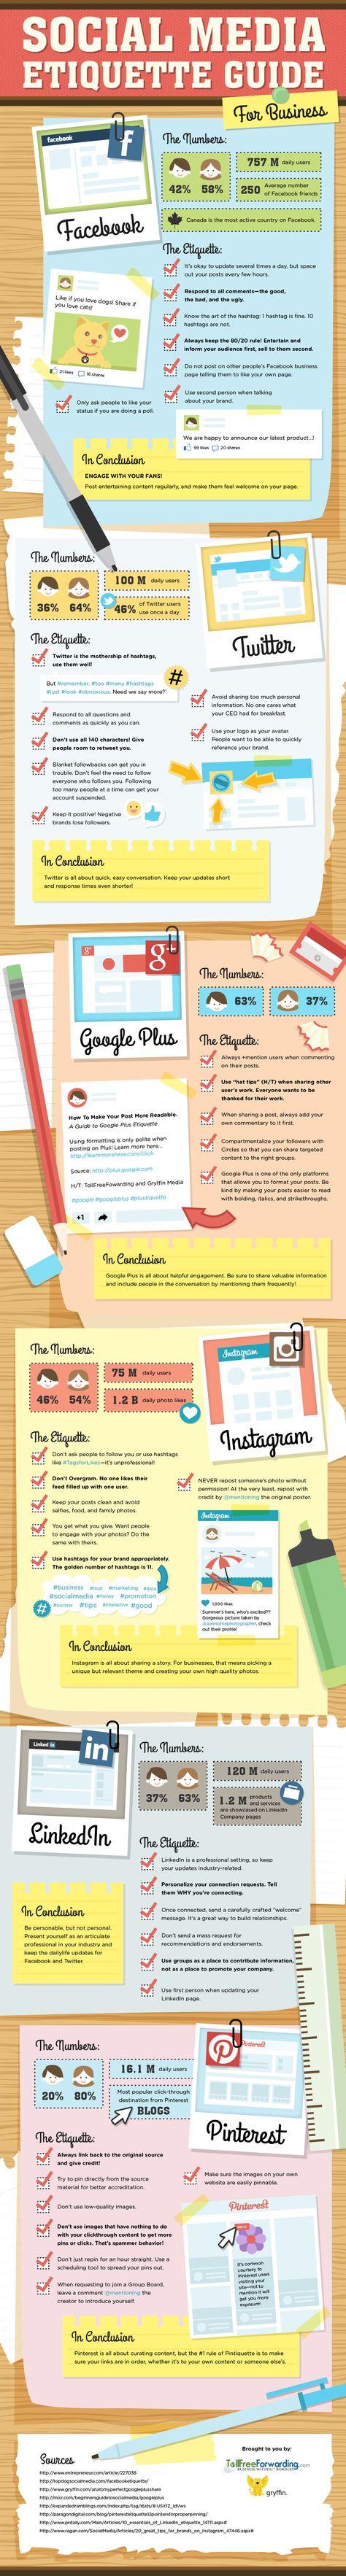 The Ultimate Guide For Social Media Etiquette